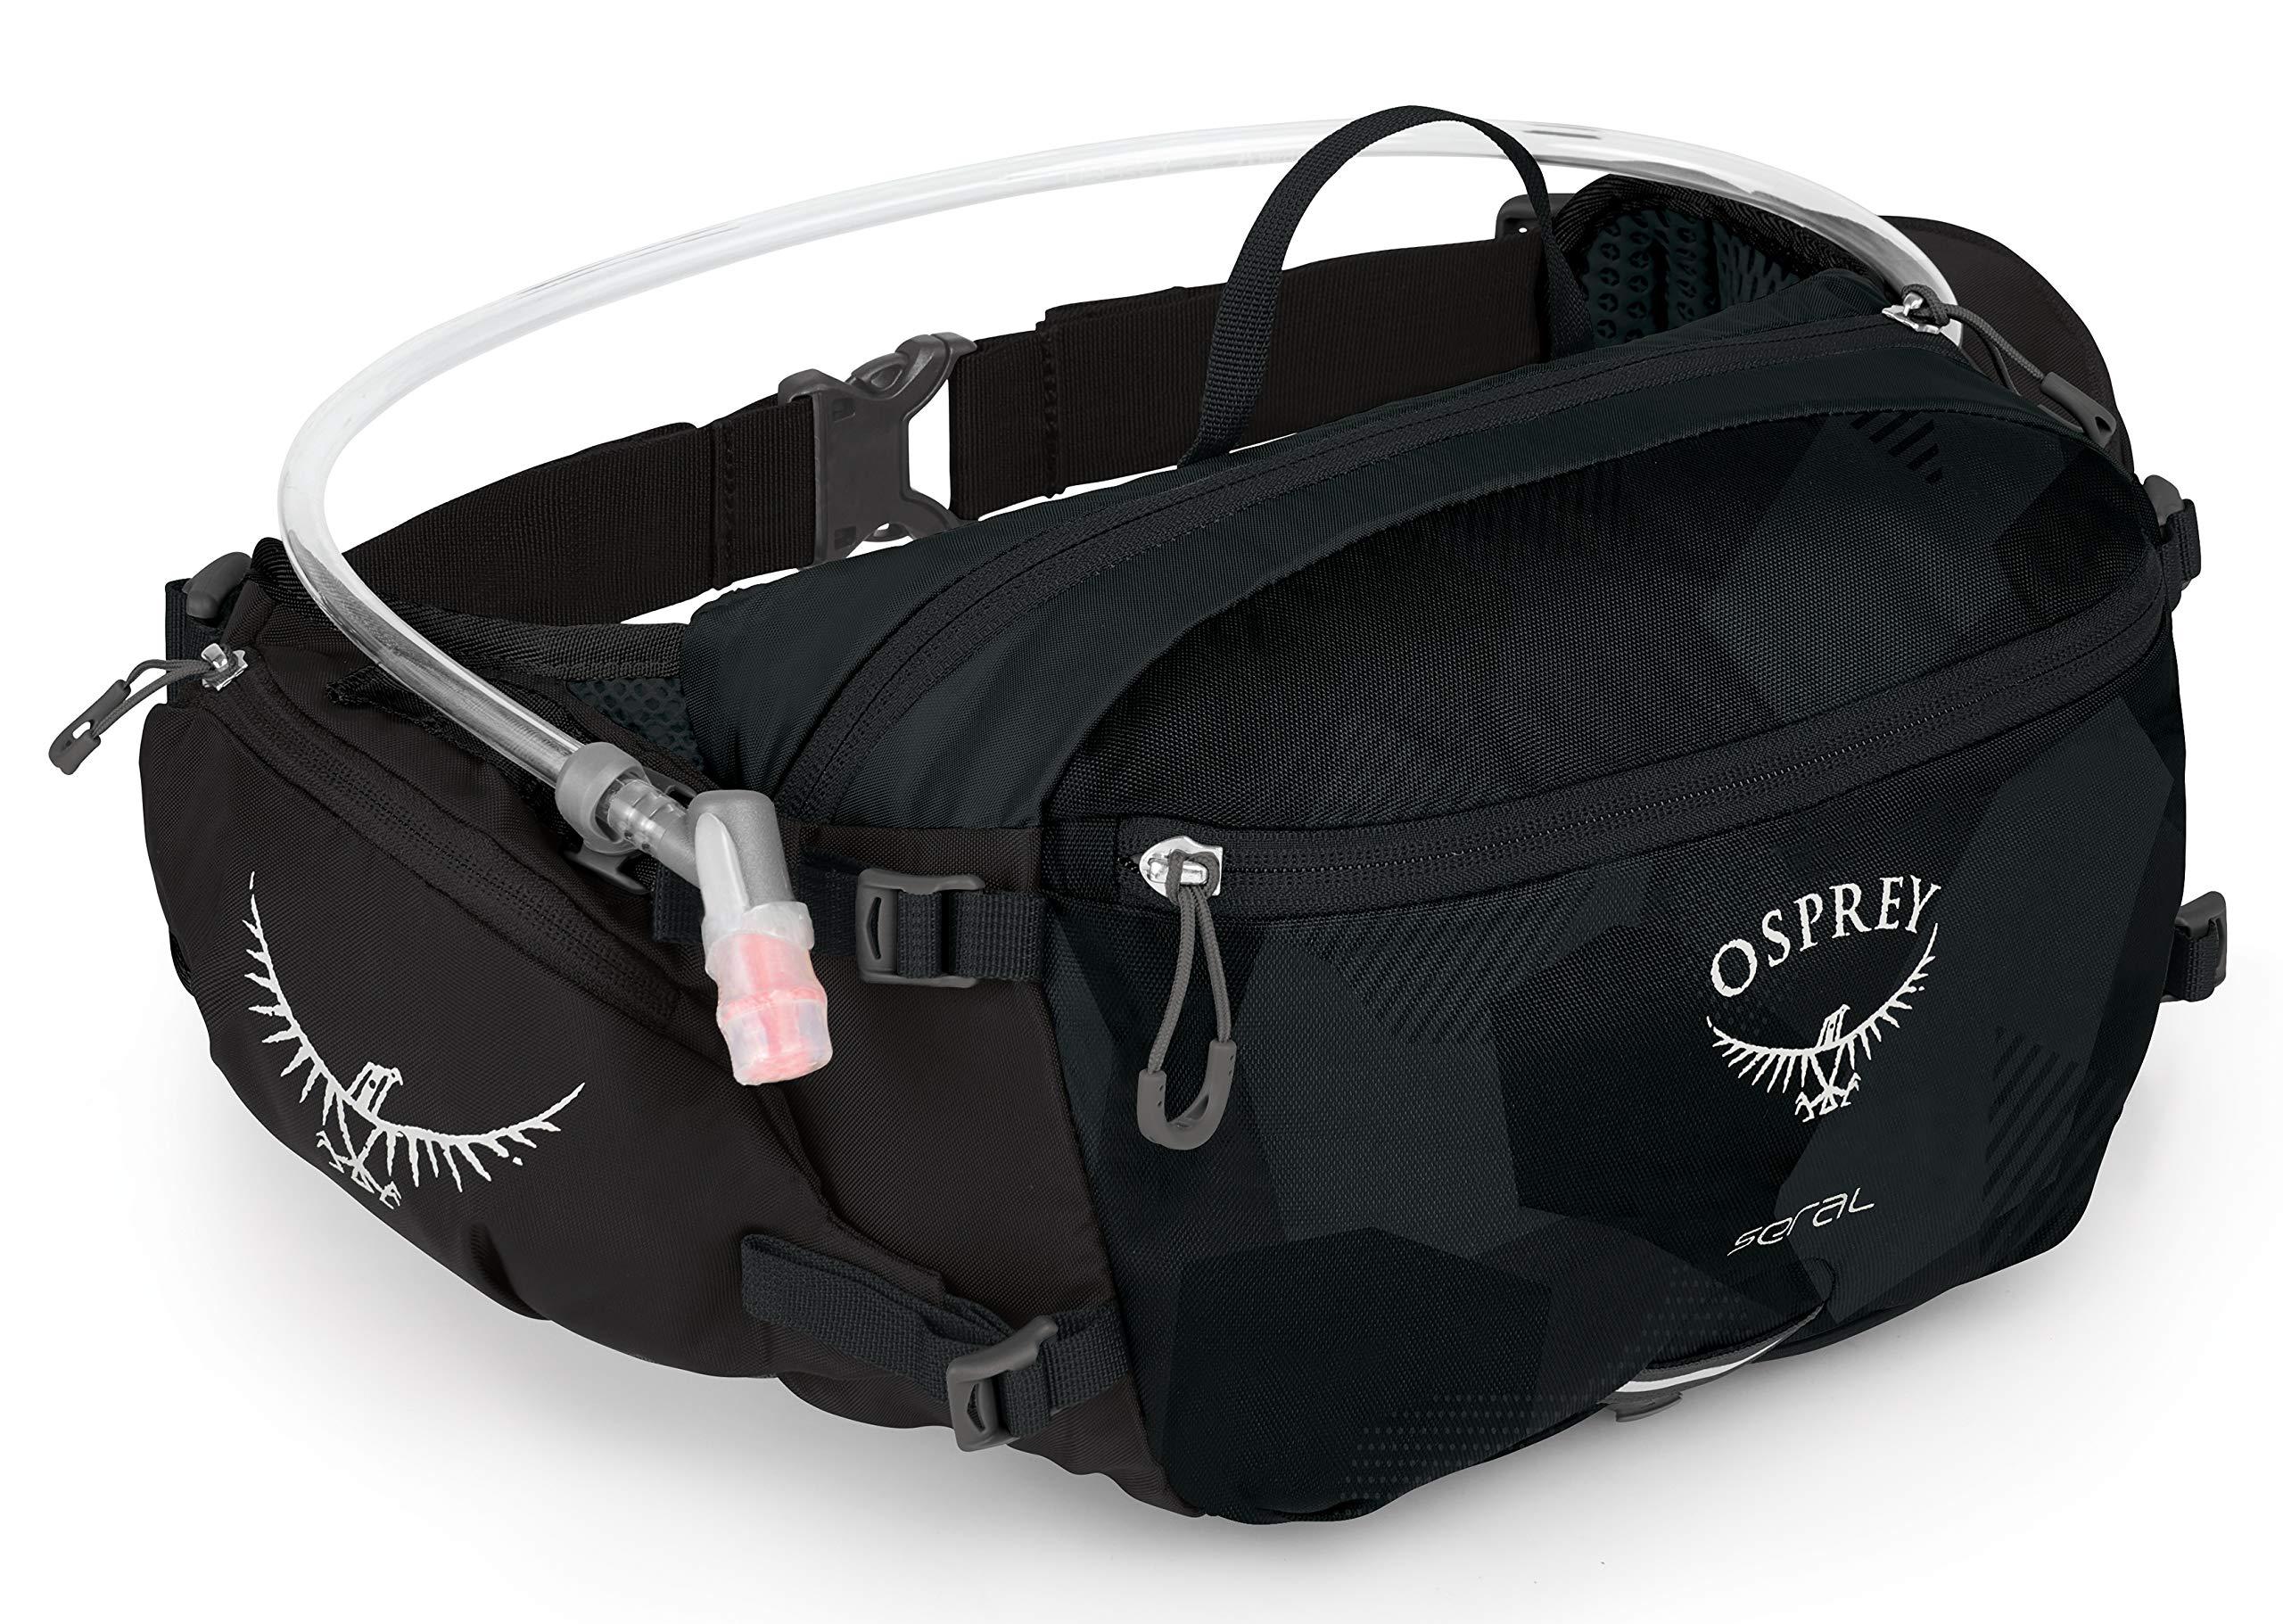 Osprey Packs Lumbar Hydration Obsidian